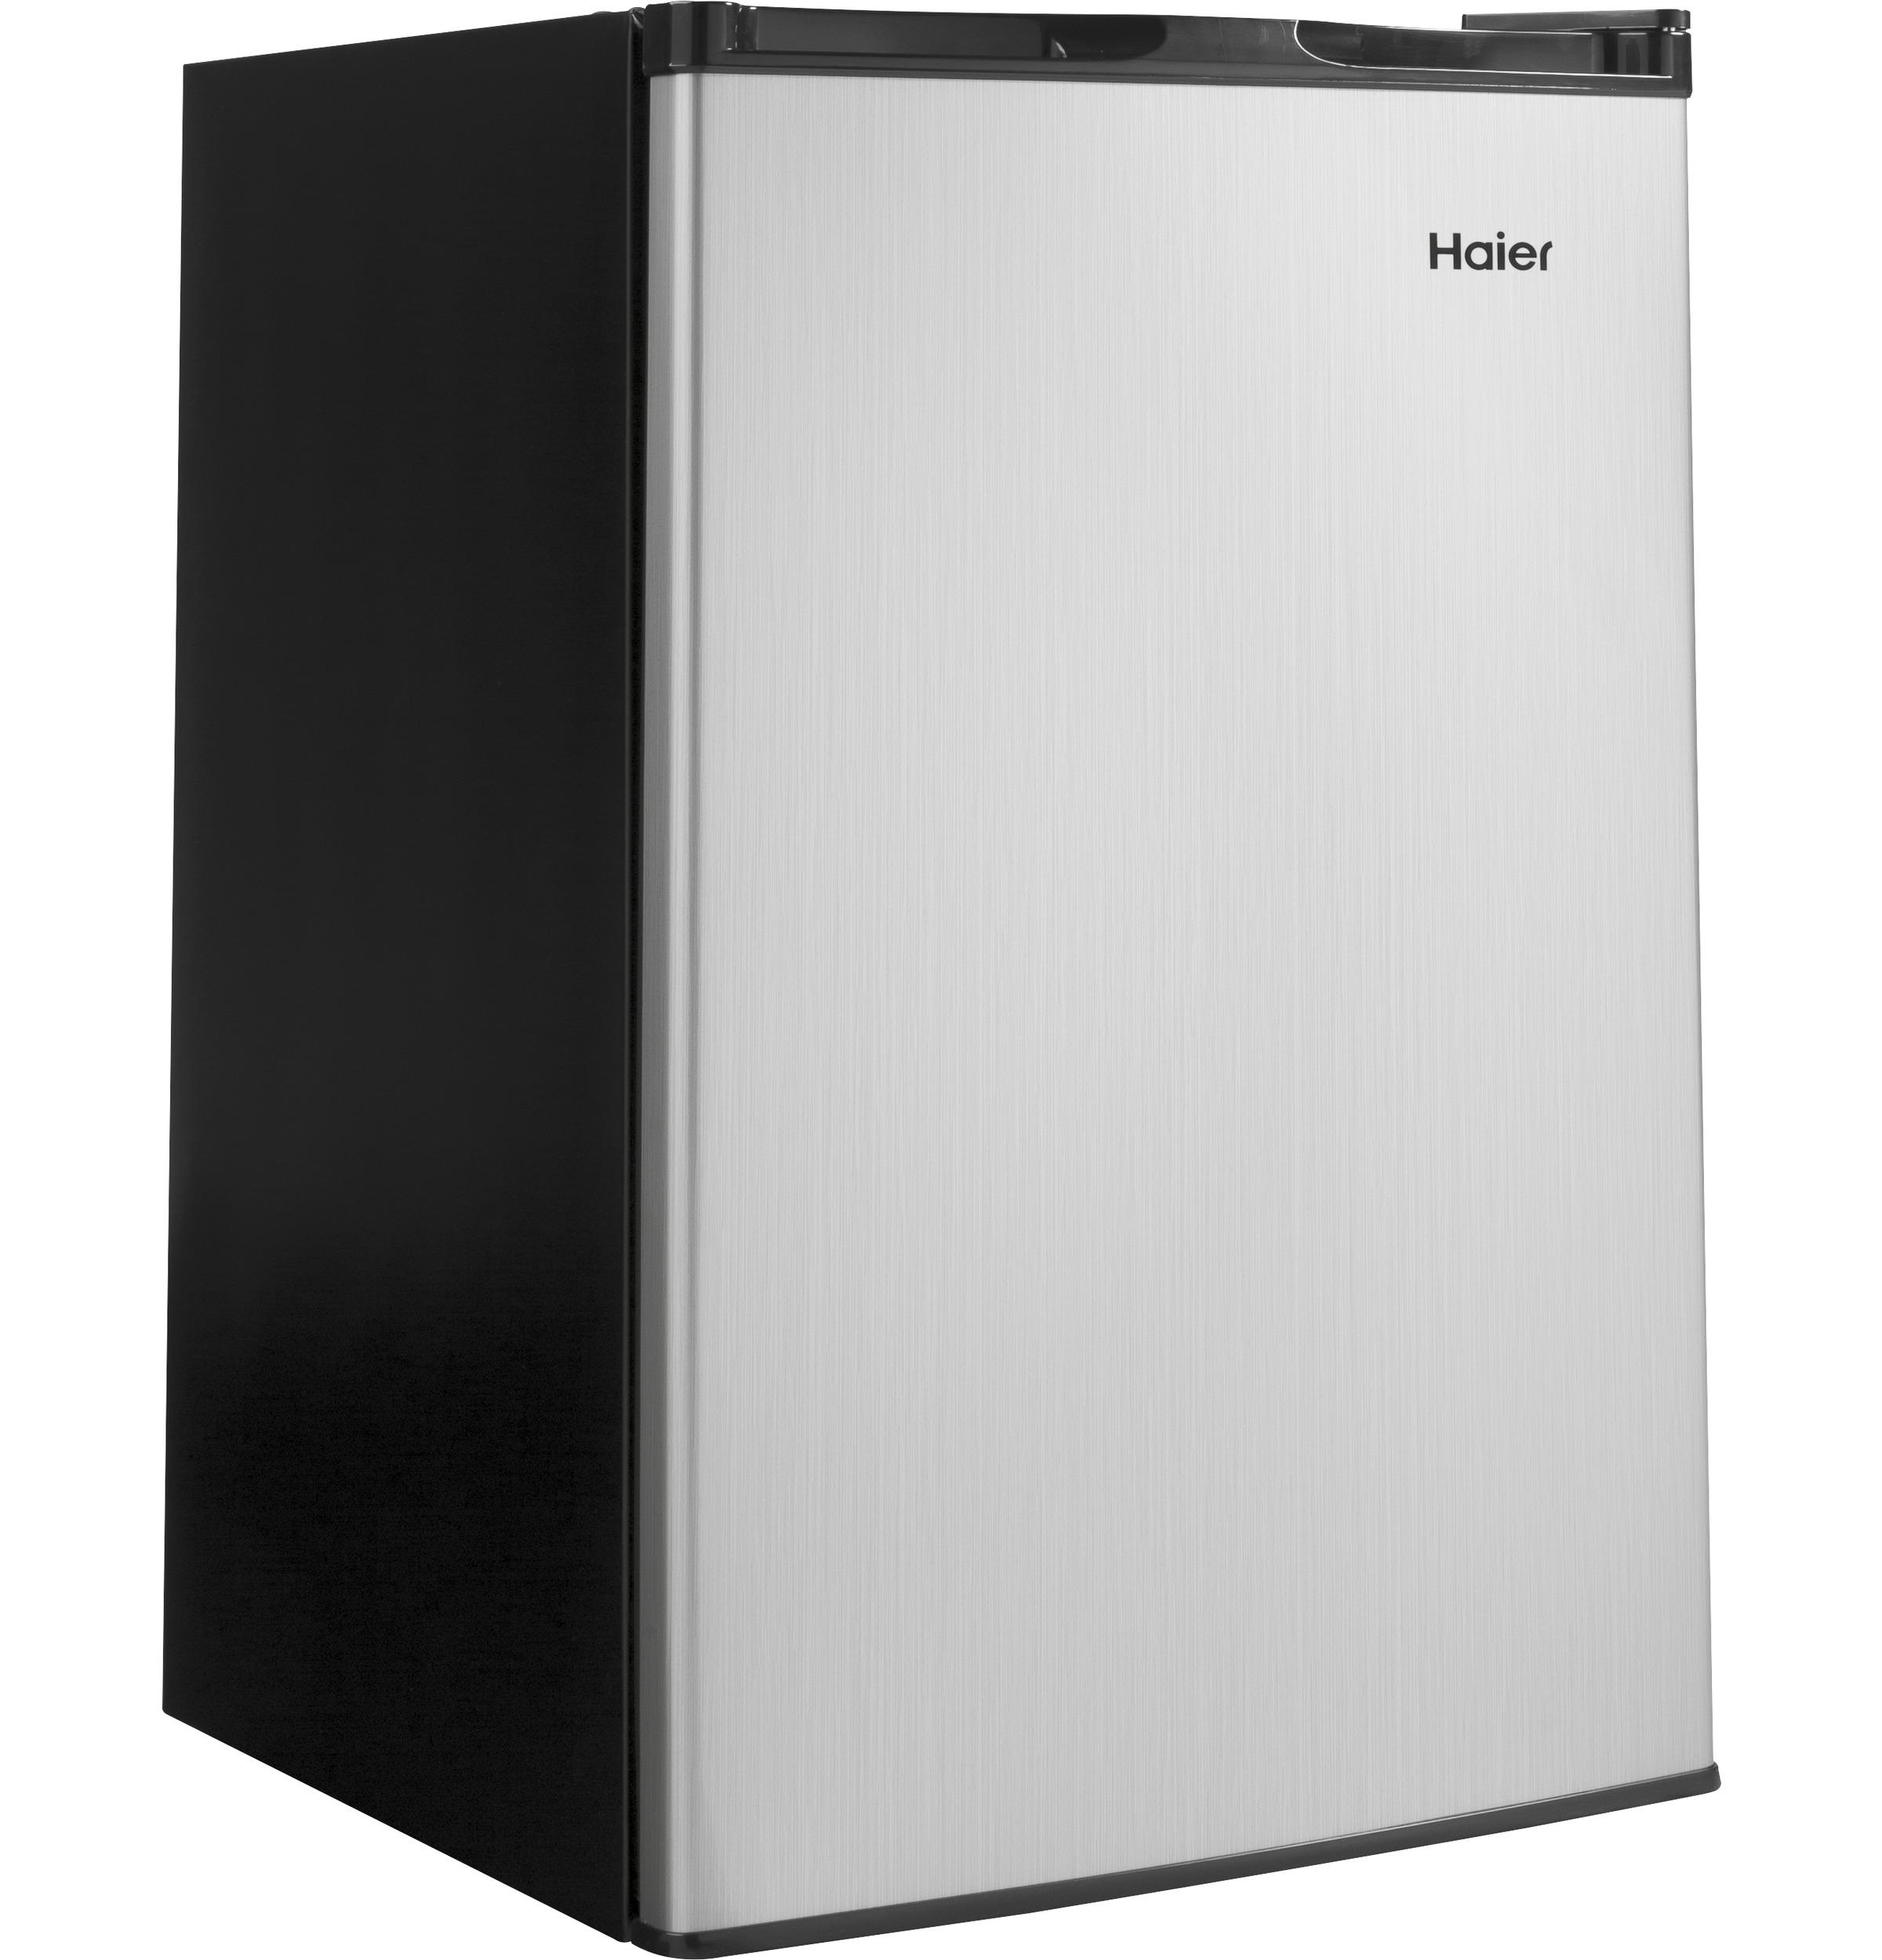 Model: HC46SF10SV | Haier 4.5 Cu. Ft. Compact Refrigerator